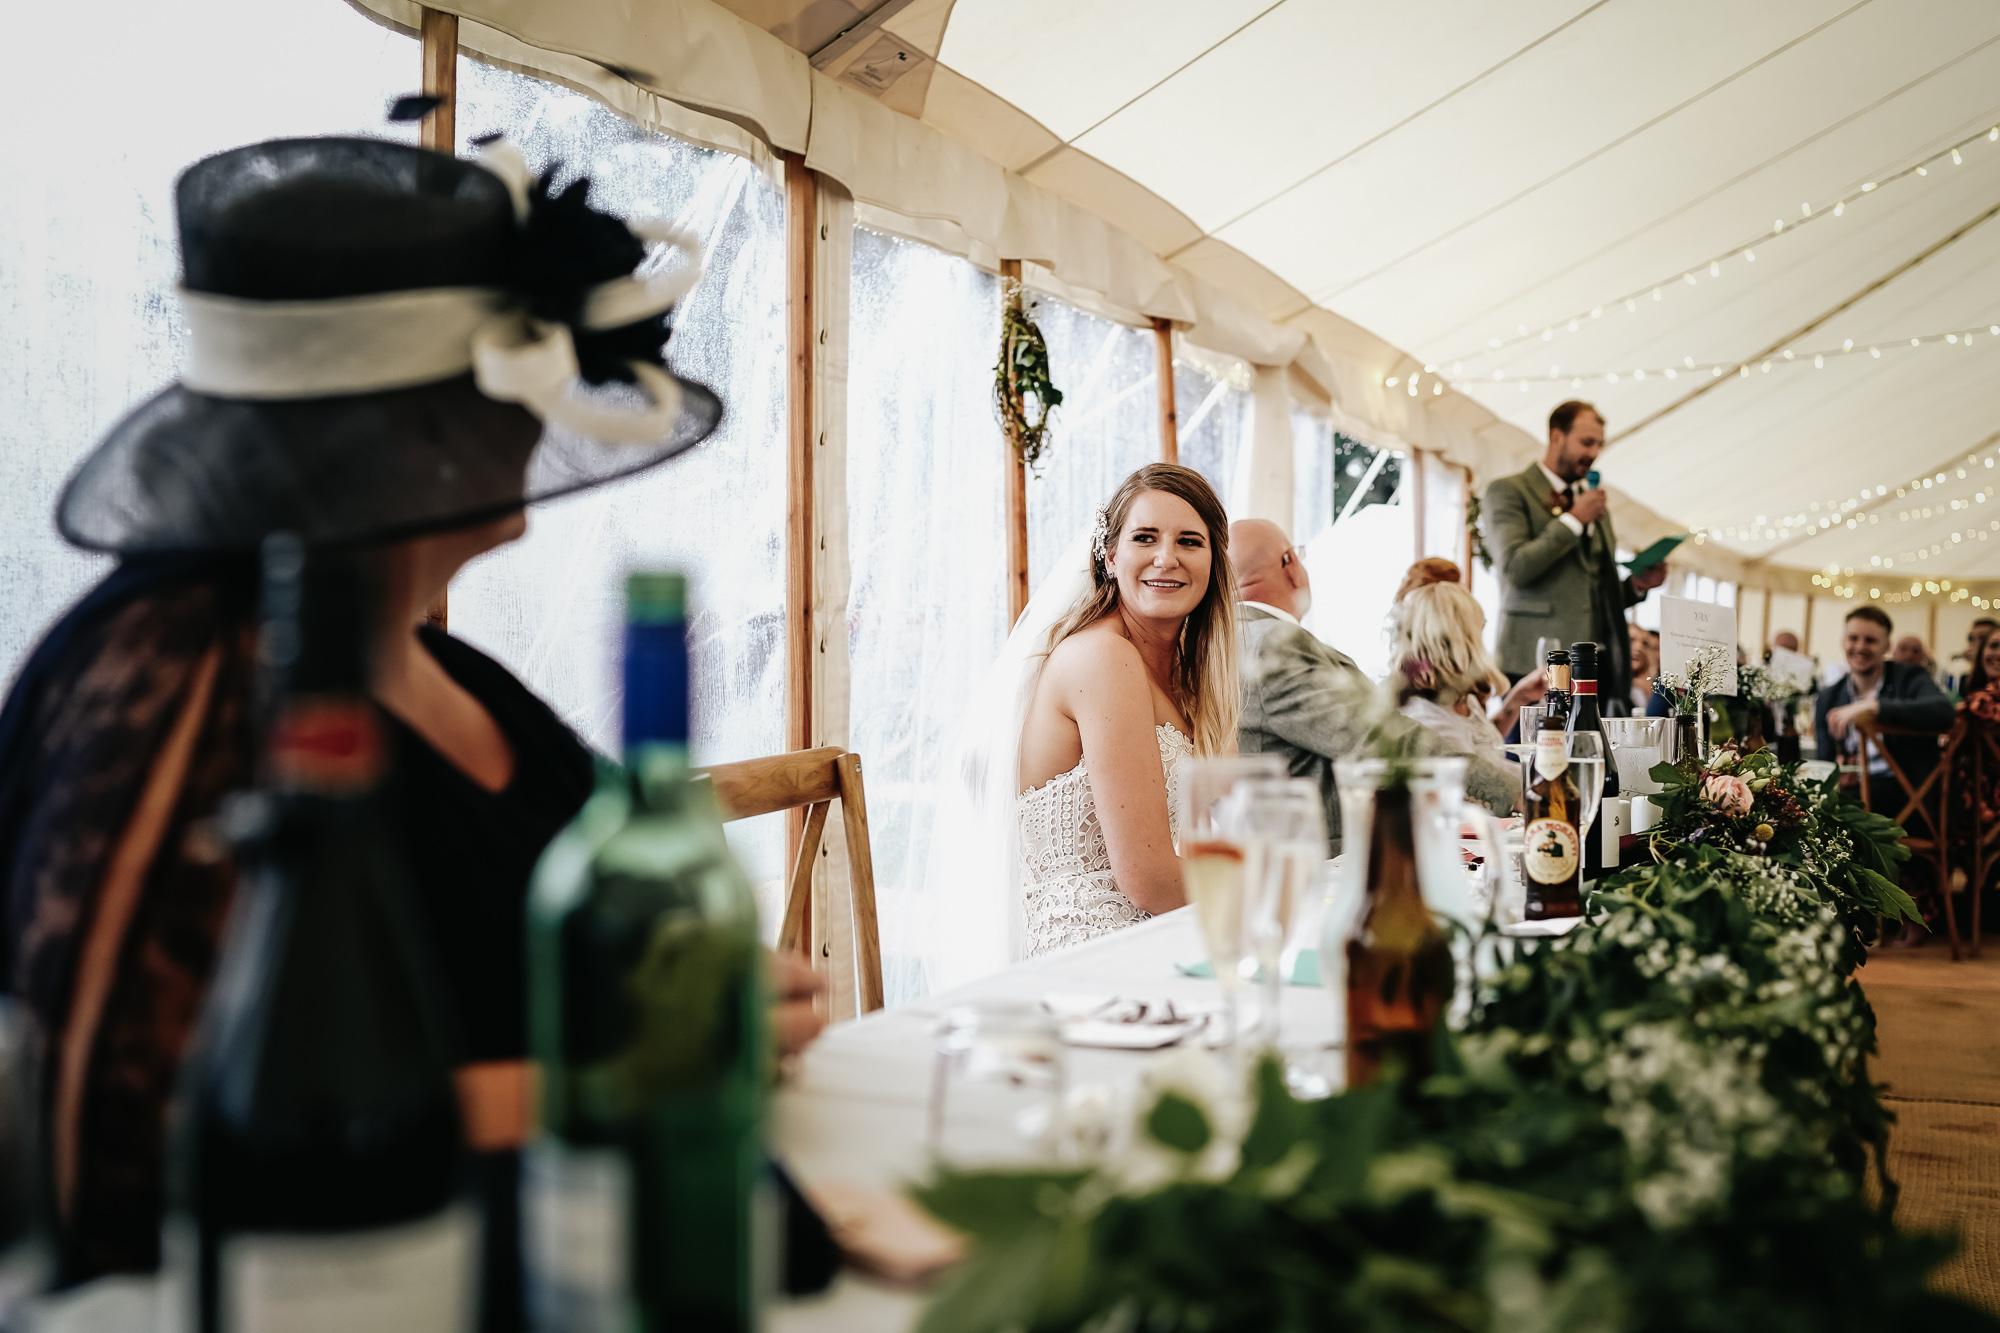 High Barn Wedding photographer lake distect penrith documentry wedding photography (44 of 57).jpg